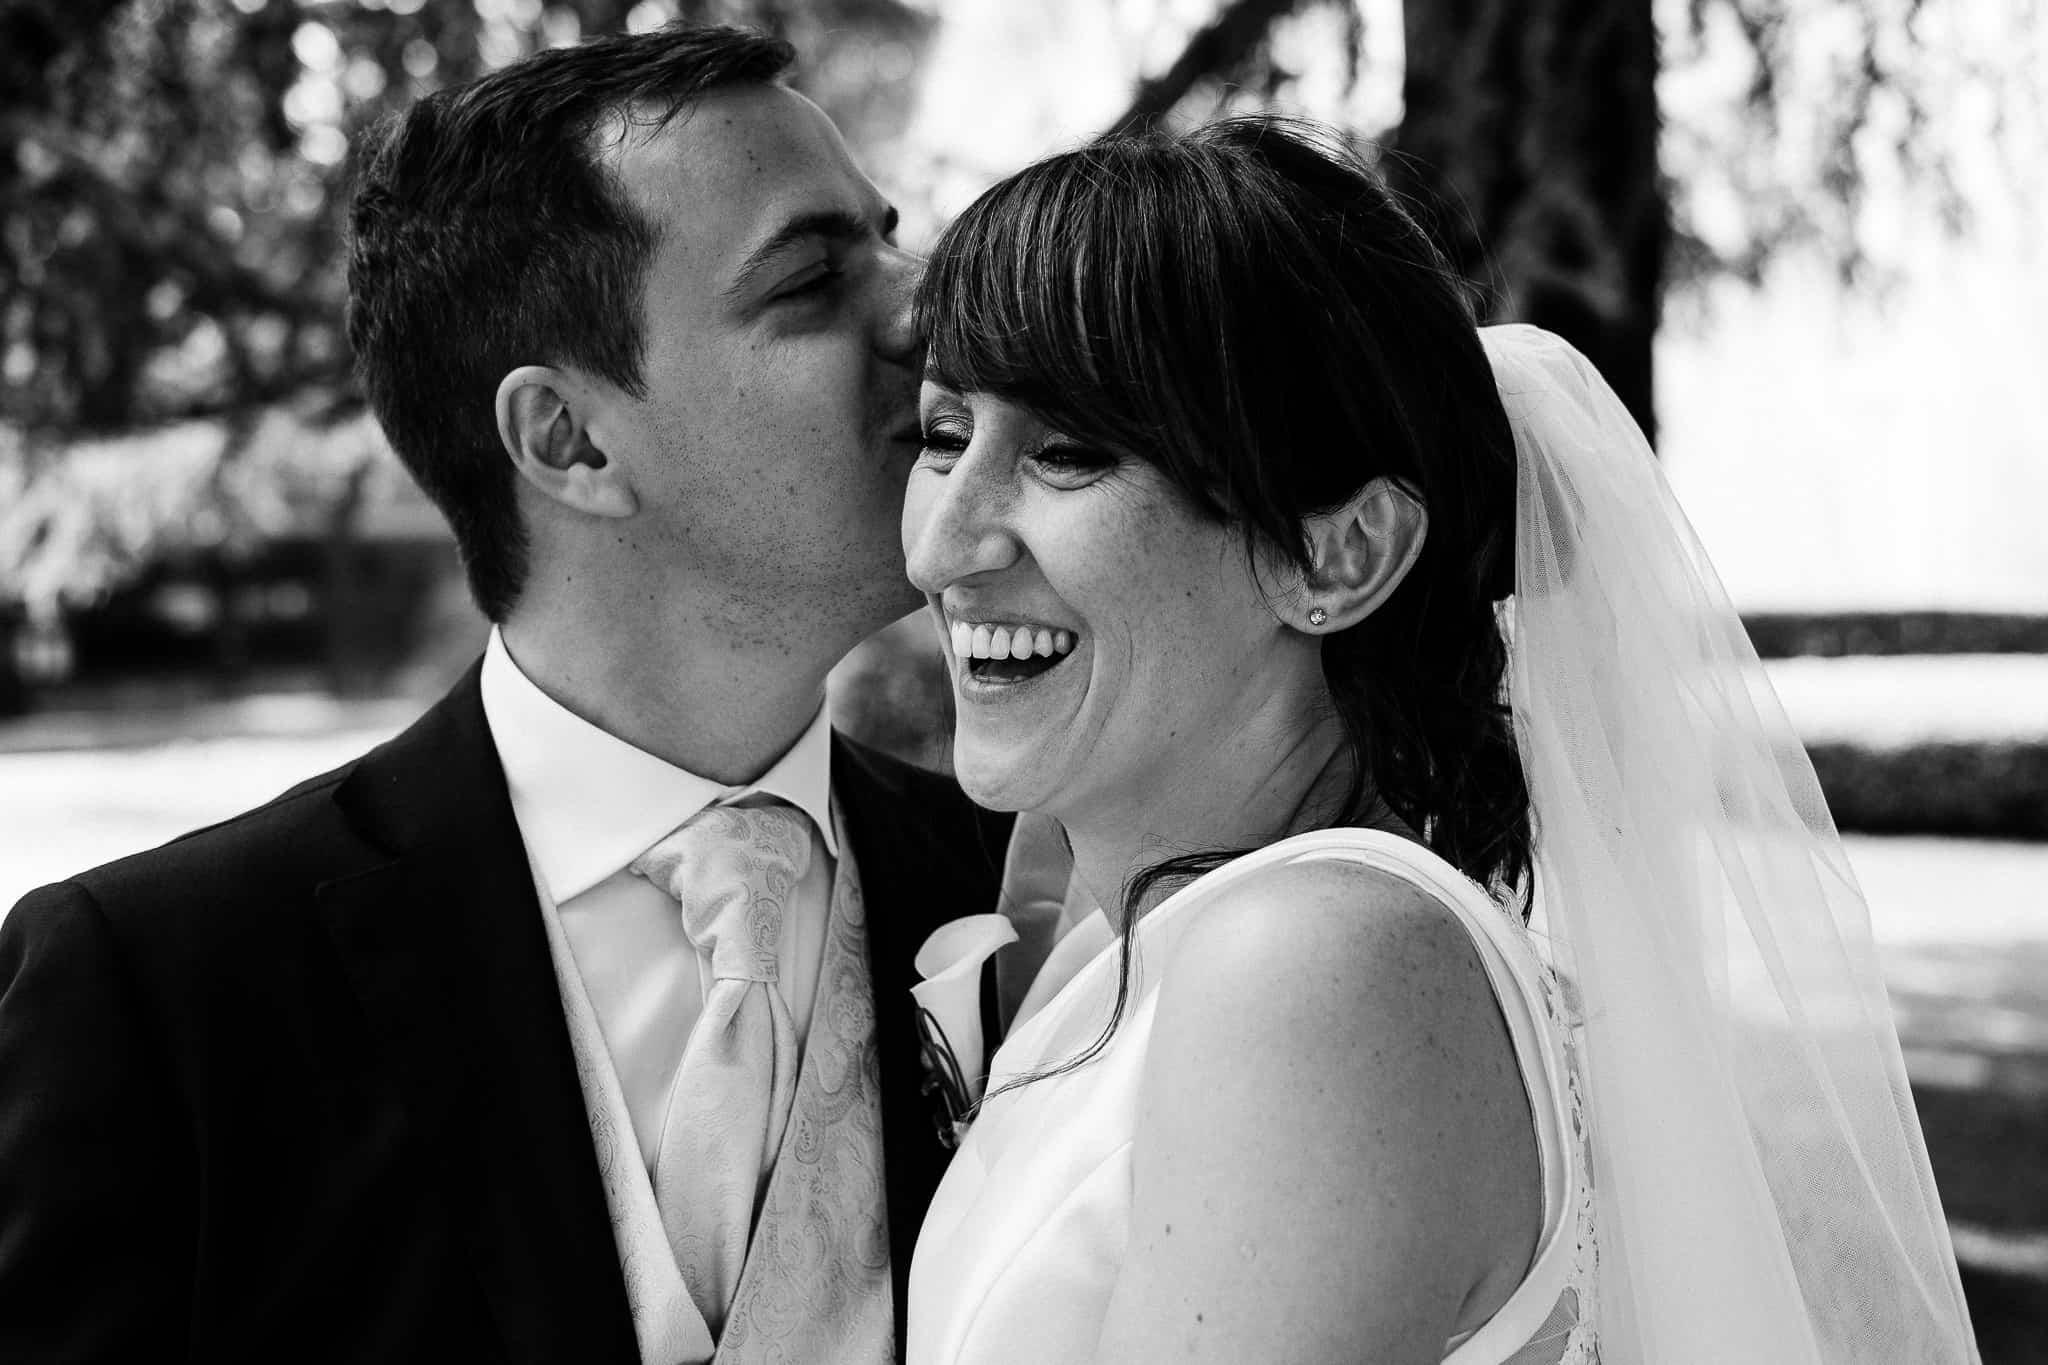 matrimonio Canter Milano San siro Luca rossi wedding reportage 0041